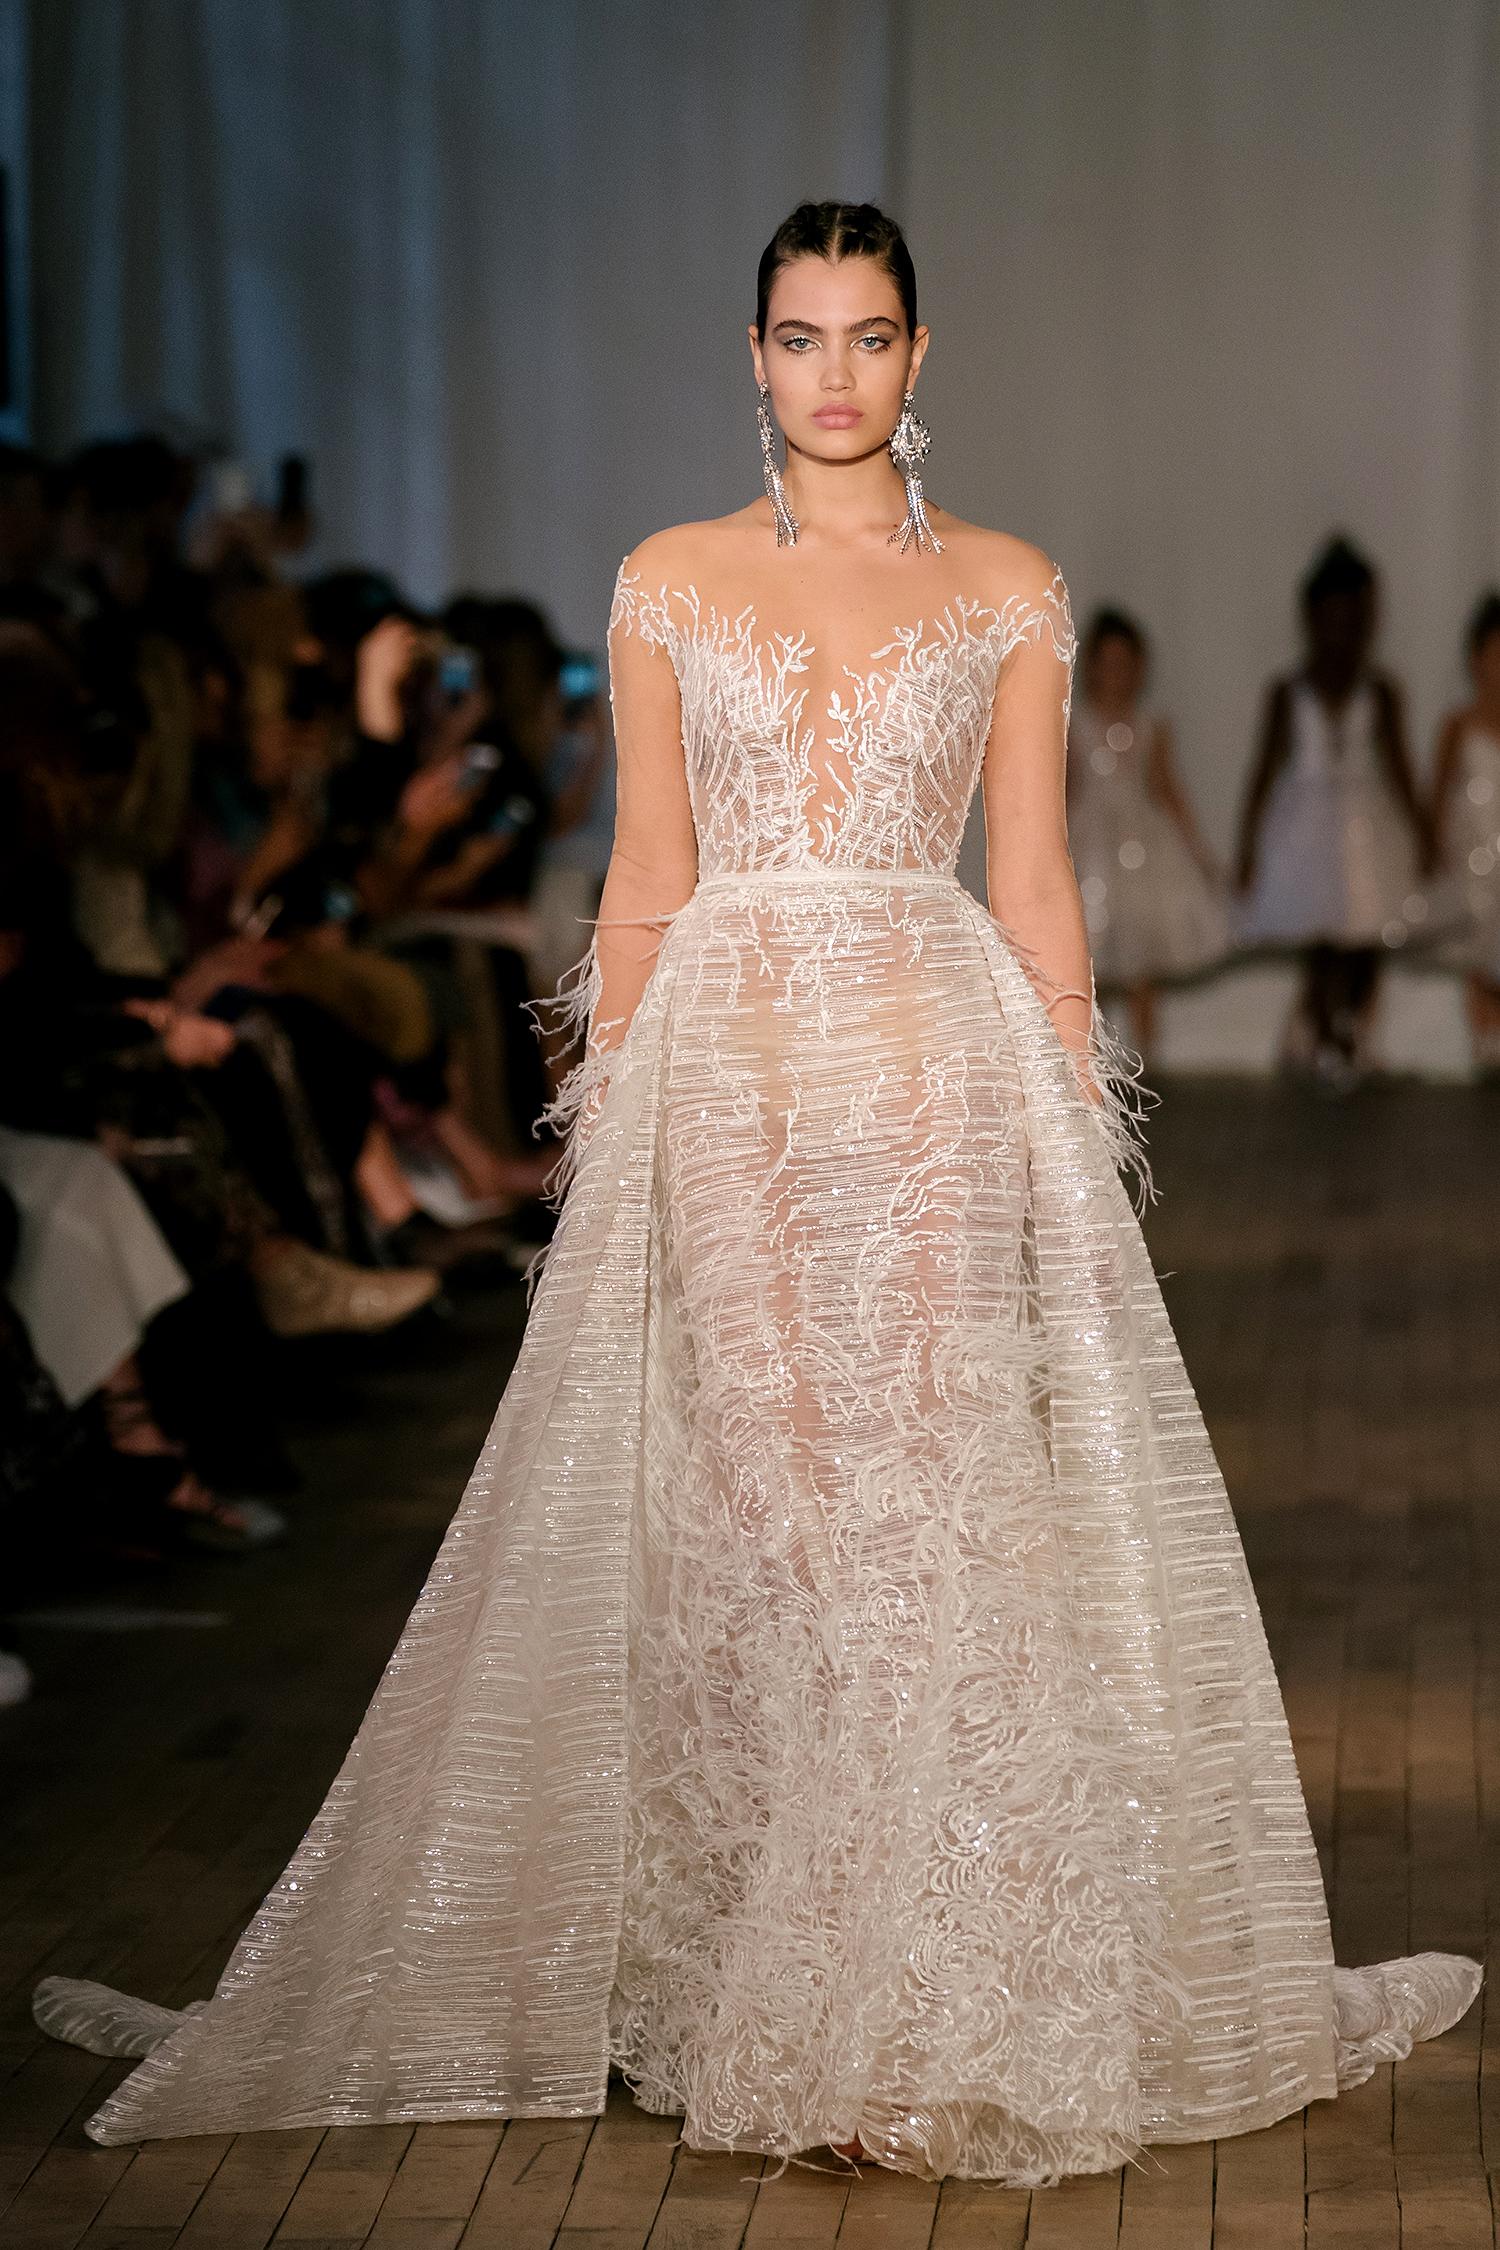 berta wedding dress spring 2019 illusion neck long-sleeved details